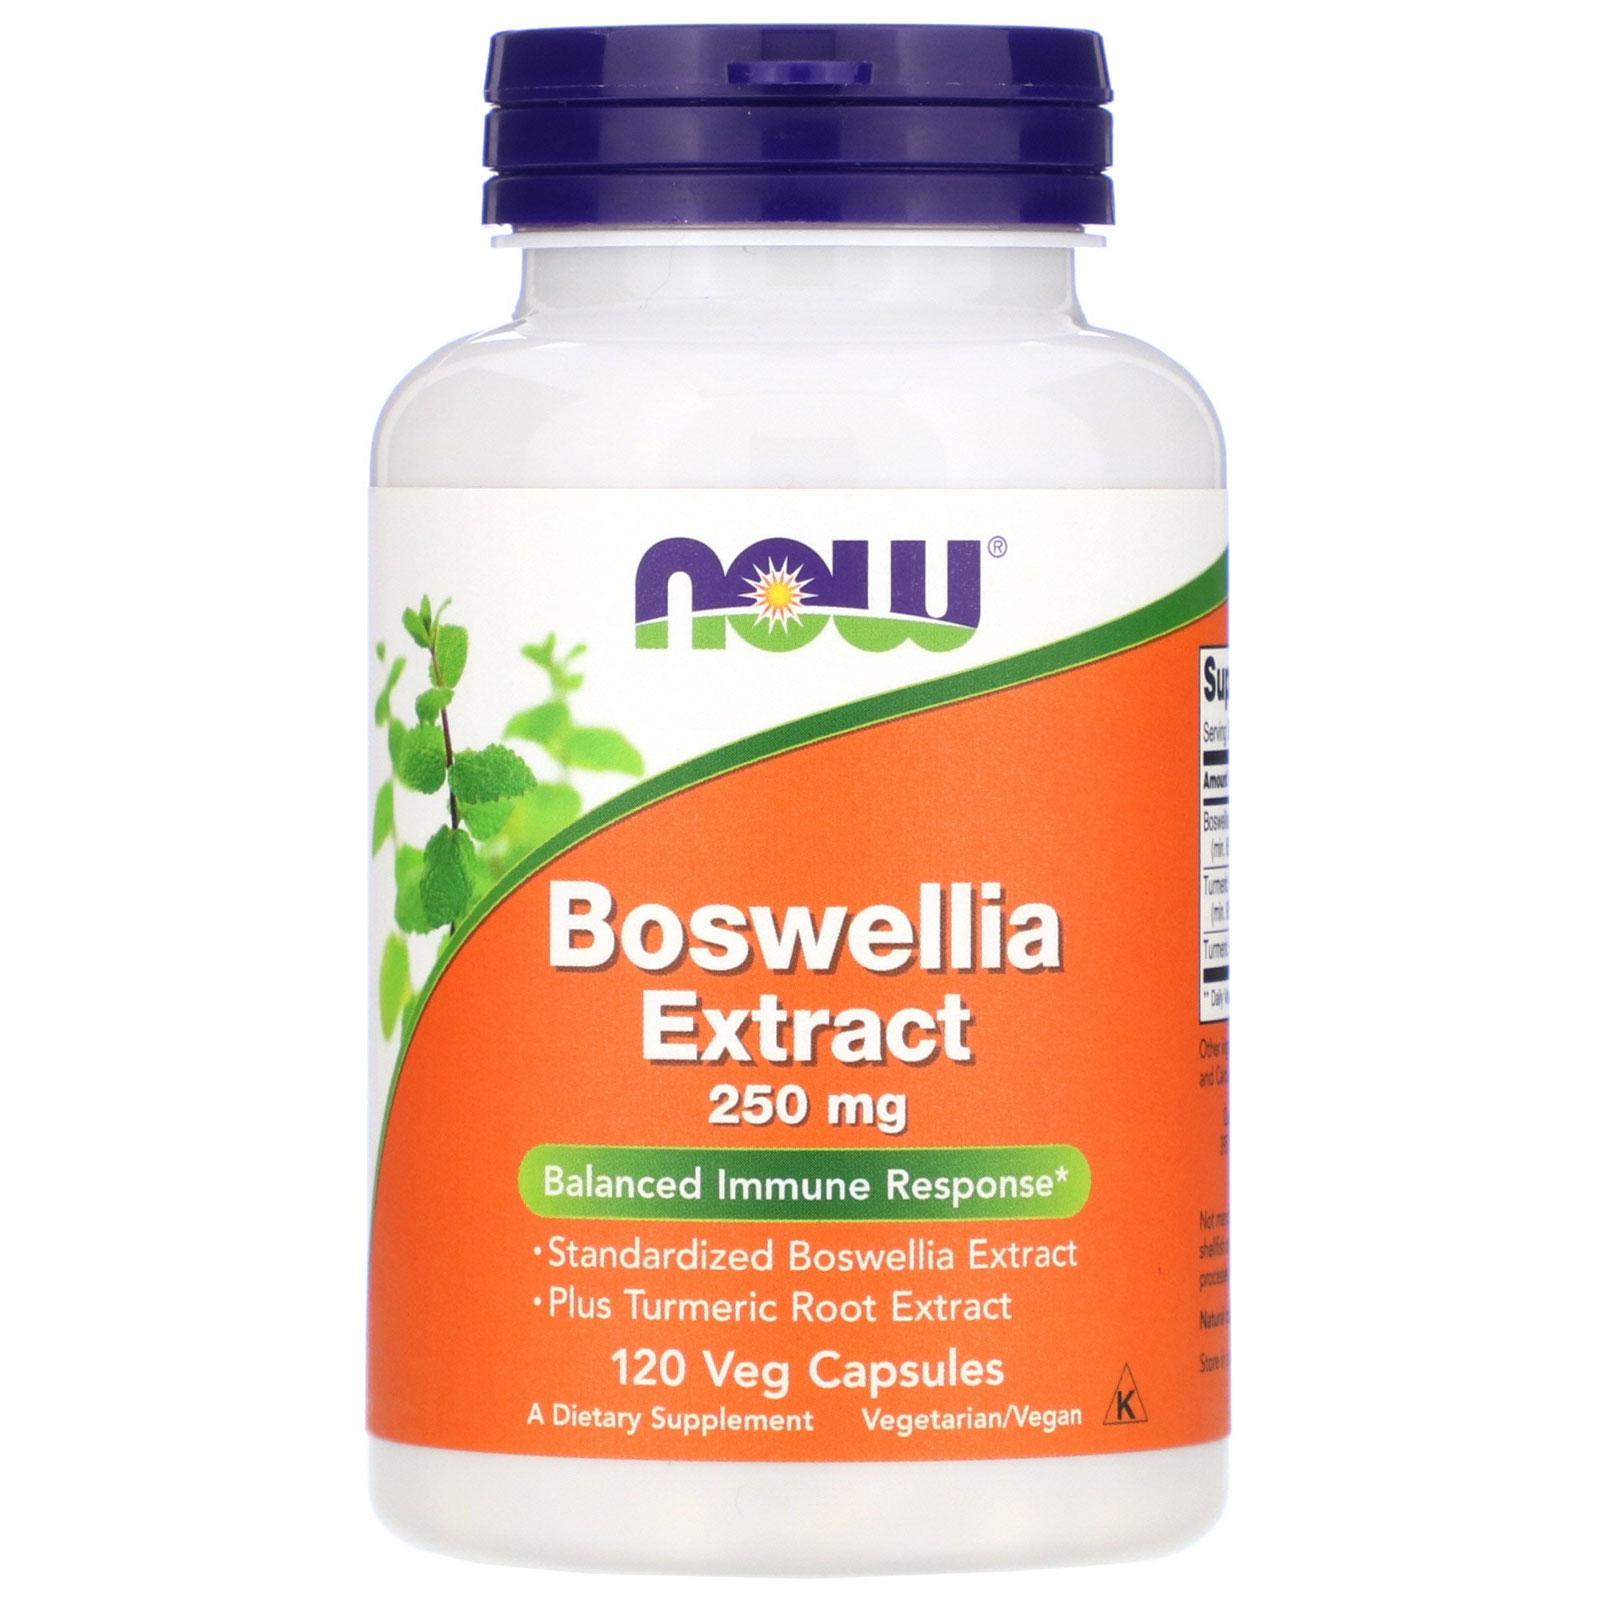 Image of Estratto di Boswellia 250mg (120 Veg Caps) - Now Foods 0733739046147